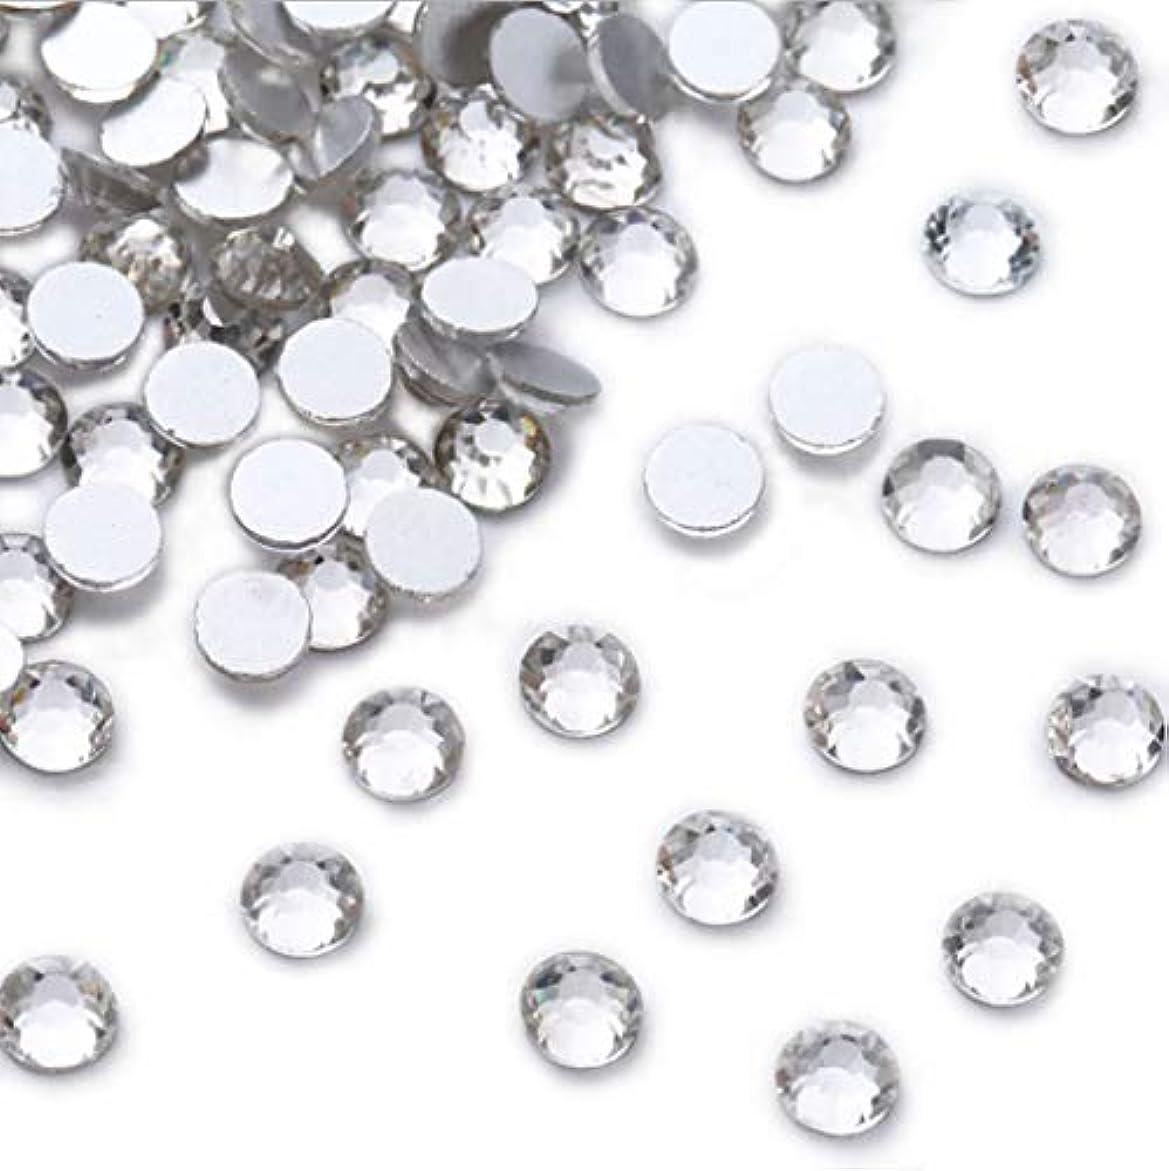 XIULIラインストーン DIY ネイルを飾てと服装使用 高い採光 ホワイト ss3-30 (1.6mm ss4(1440粒), サイズ)